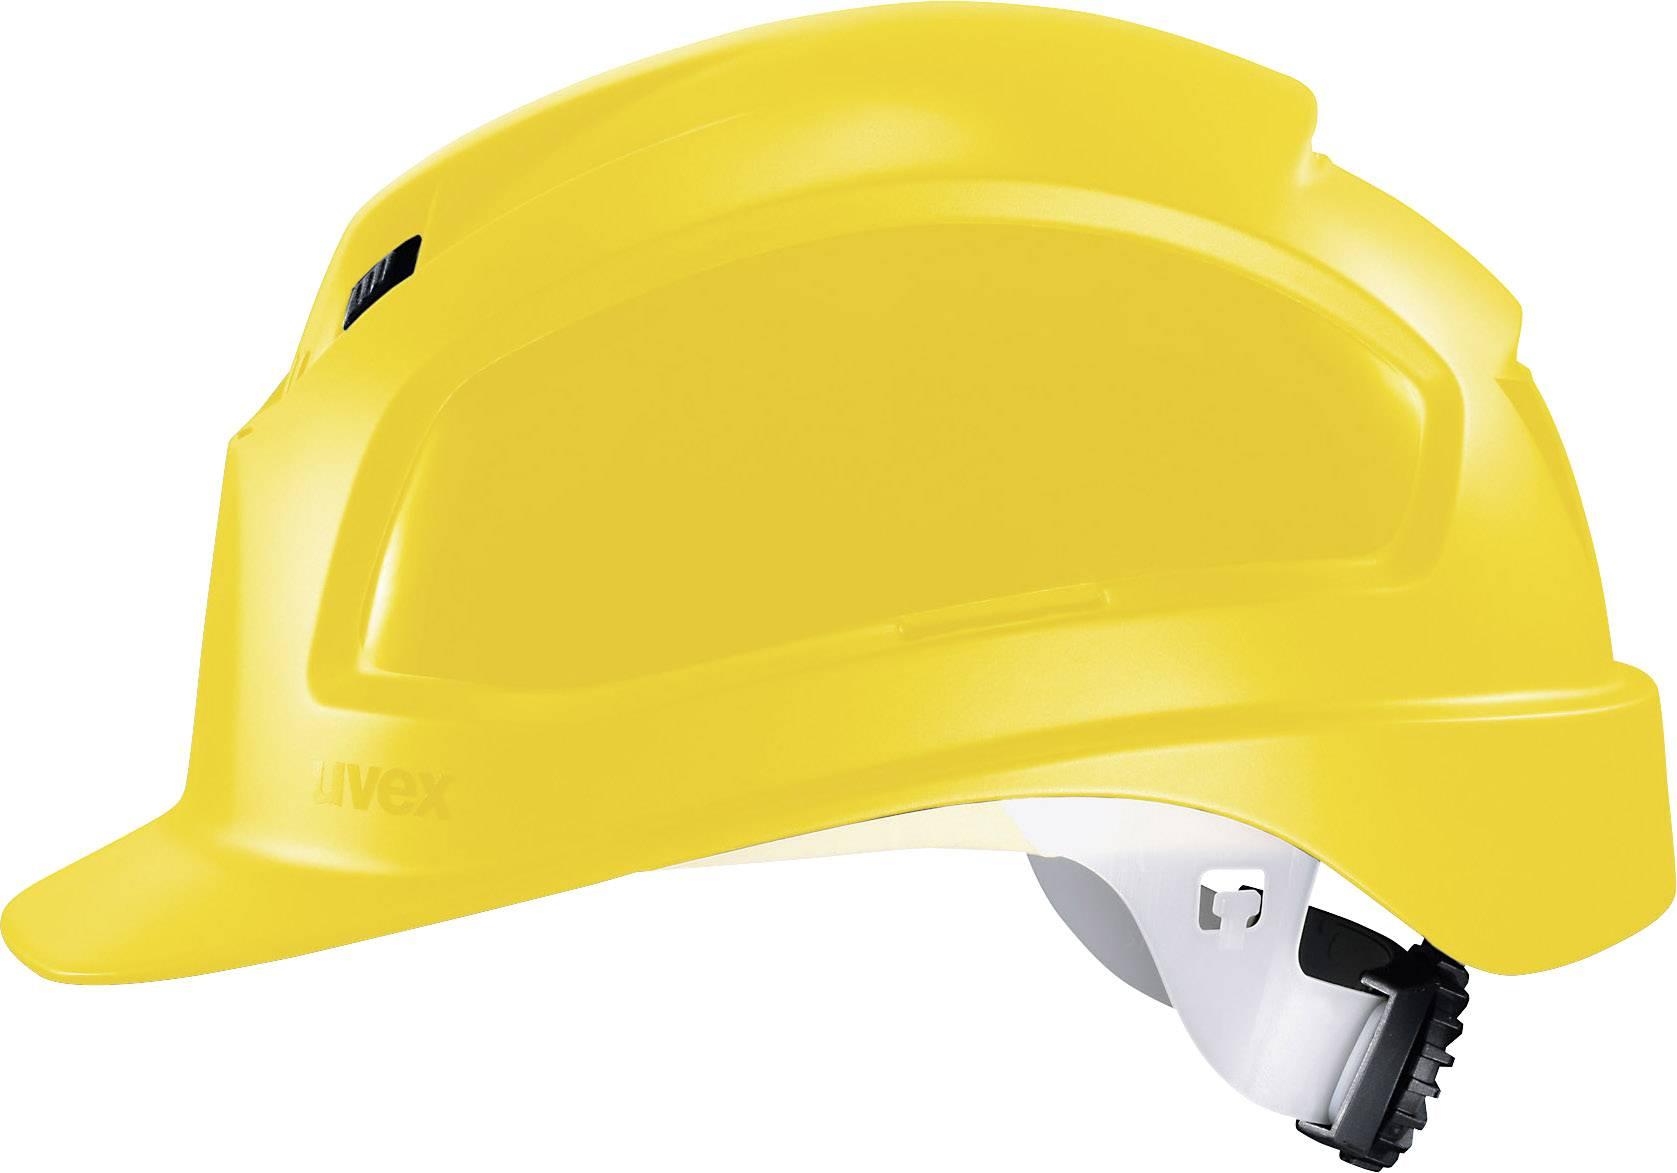 Ochranná přilba pheos B-WR žlutá 9772130